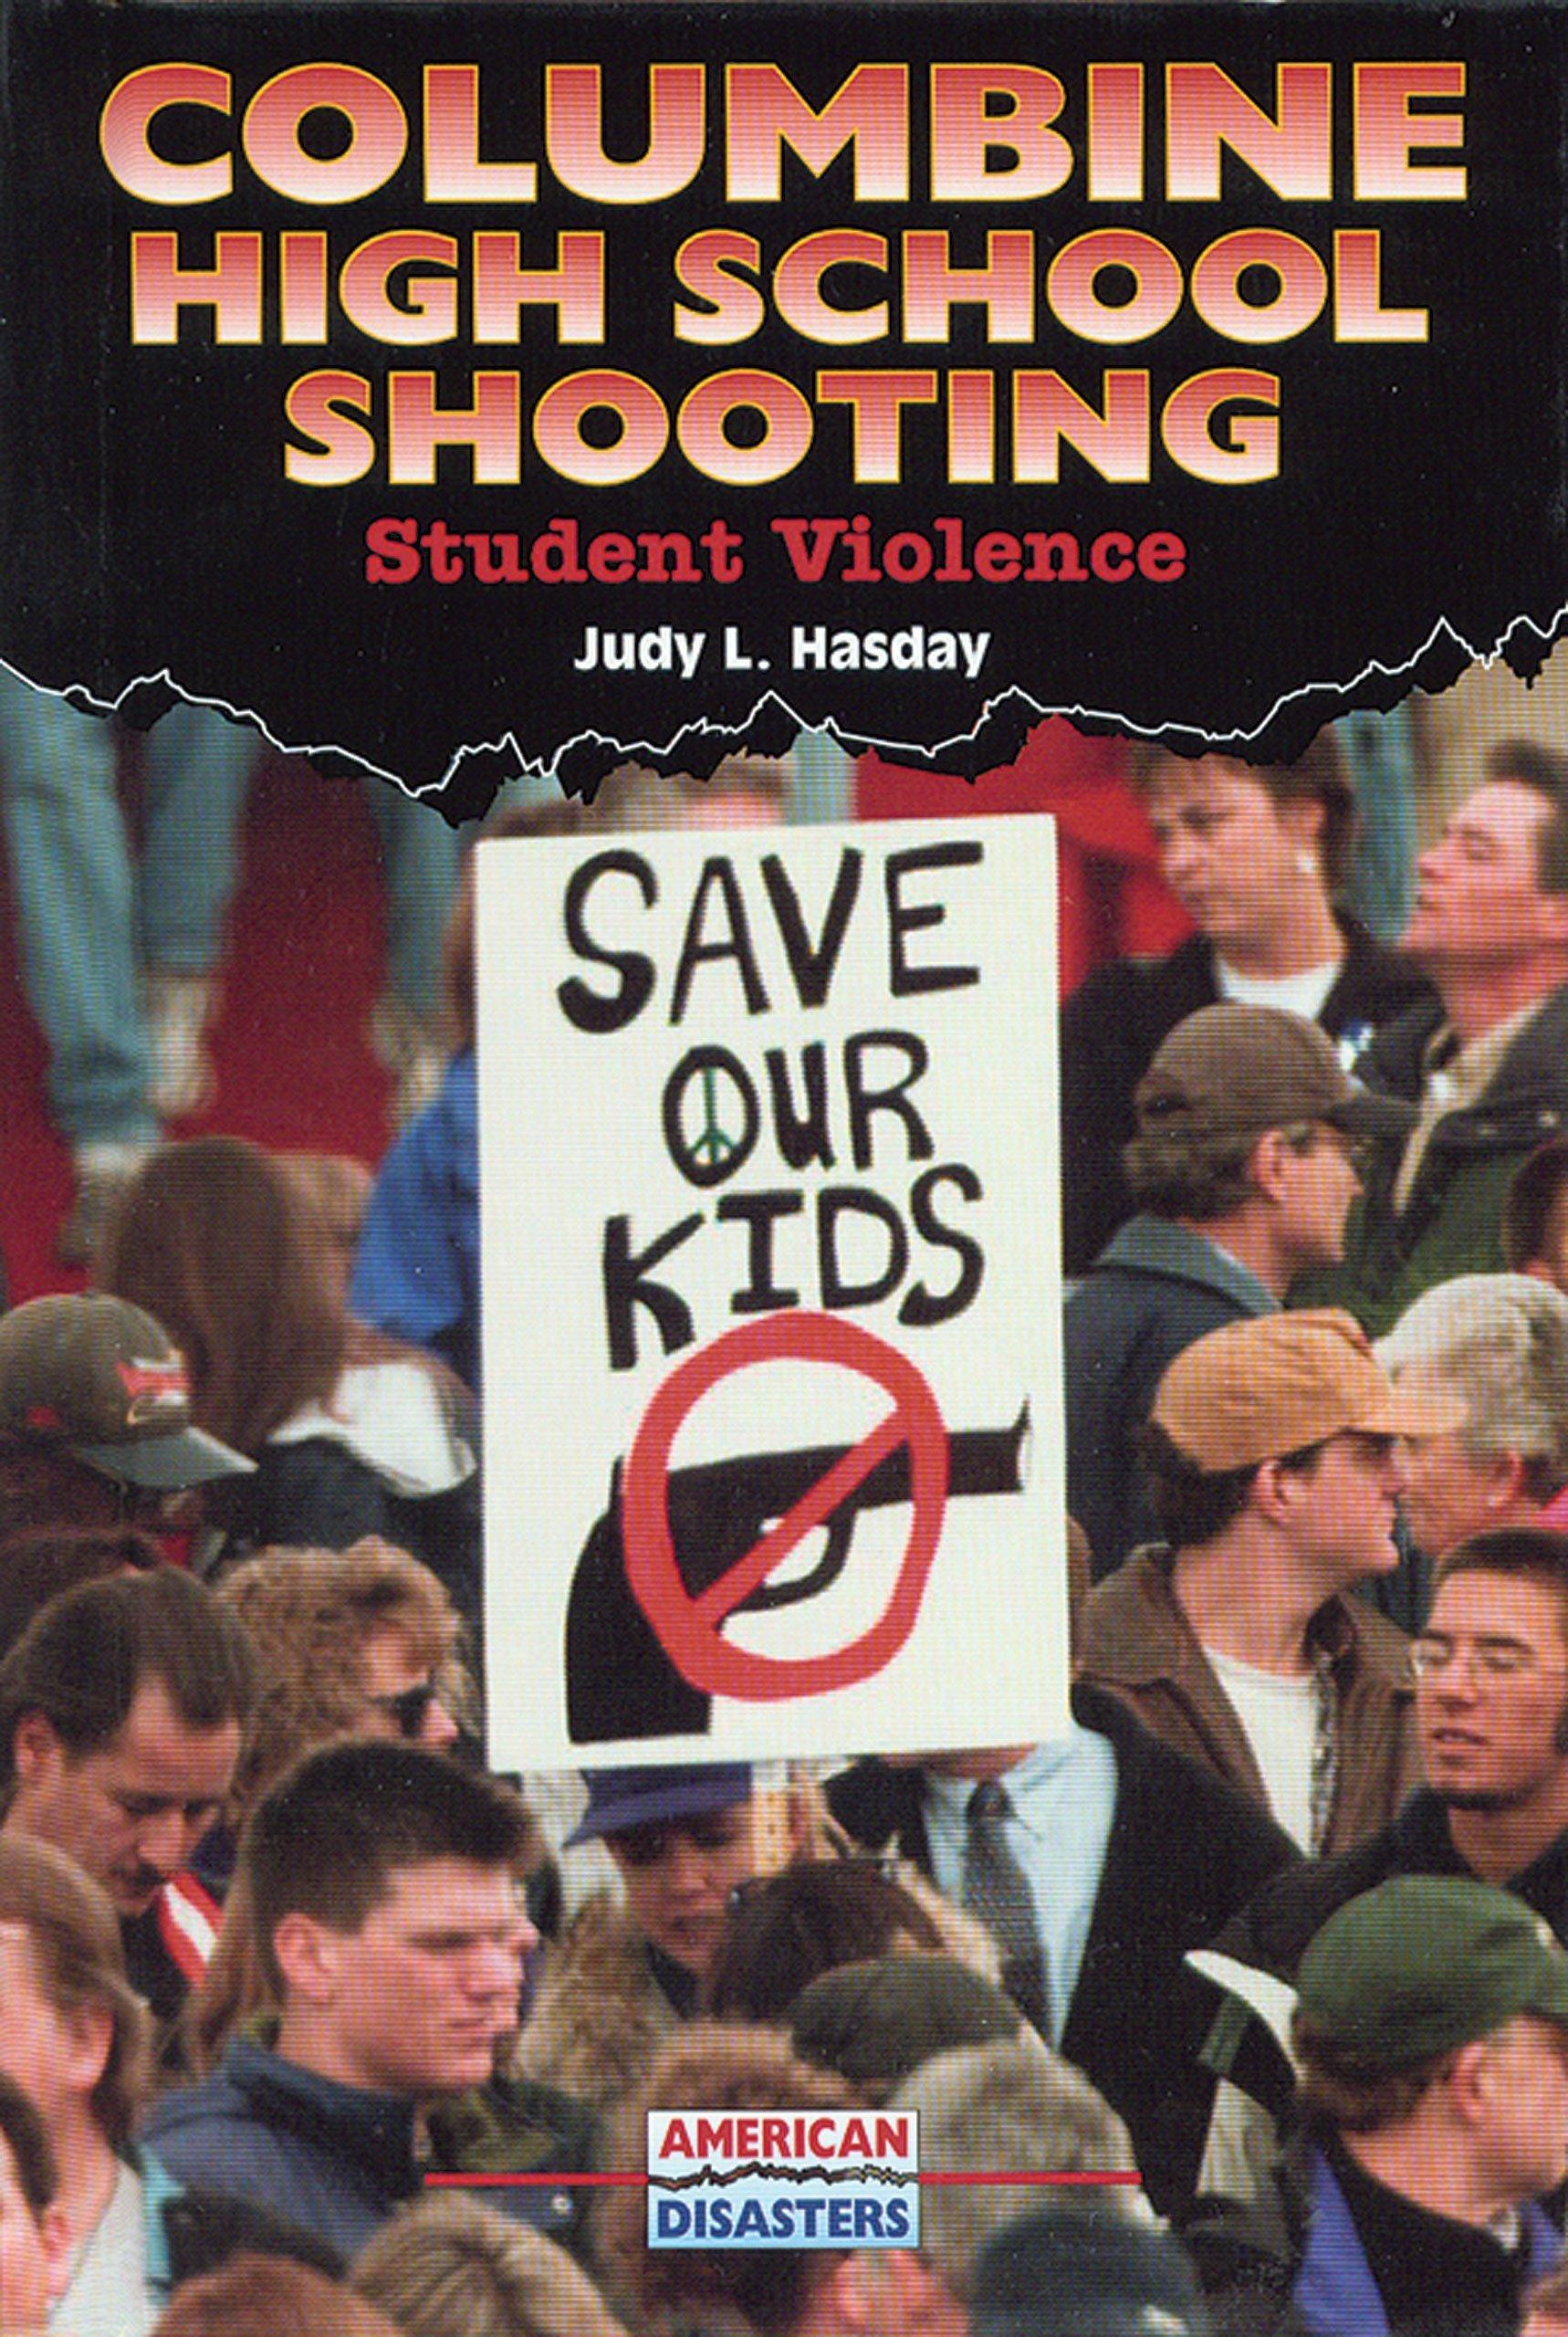 Amazon: Columbine High School Shooting: Student Violence (american  Disasters) (9780766017825): Judy L Hasday: Books